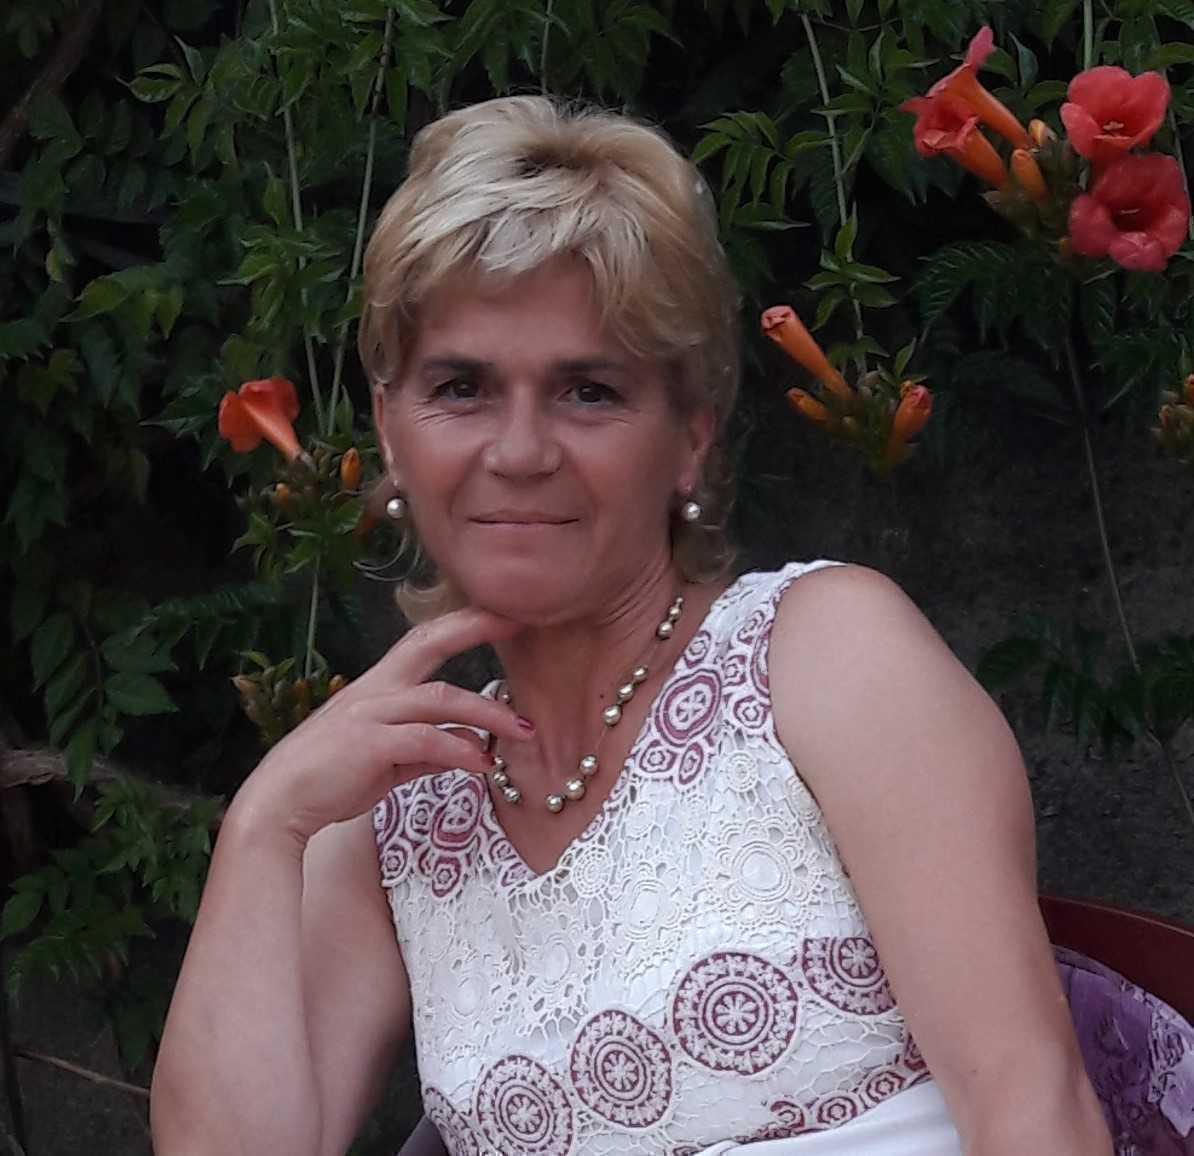 Stamenka Radović